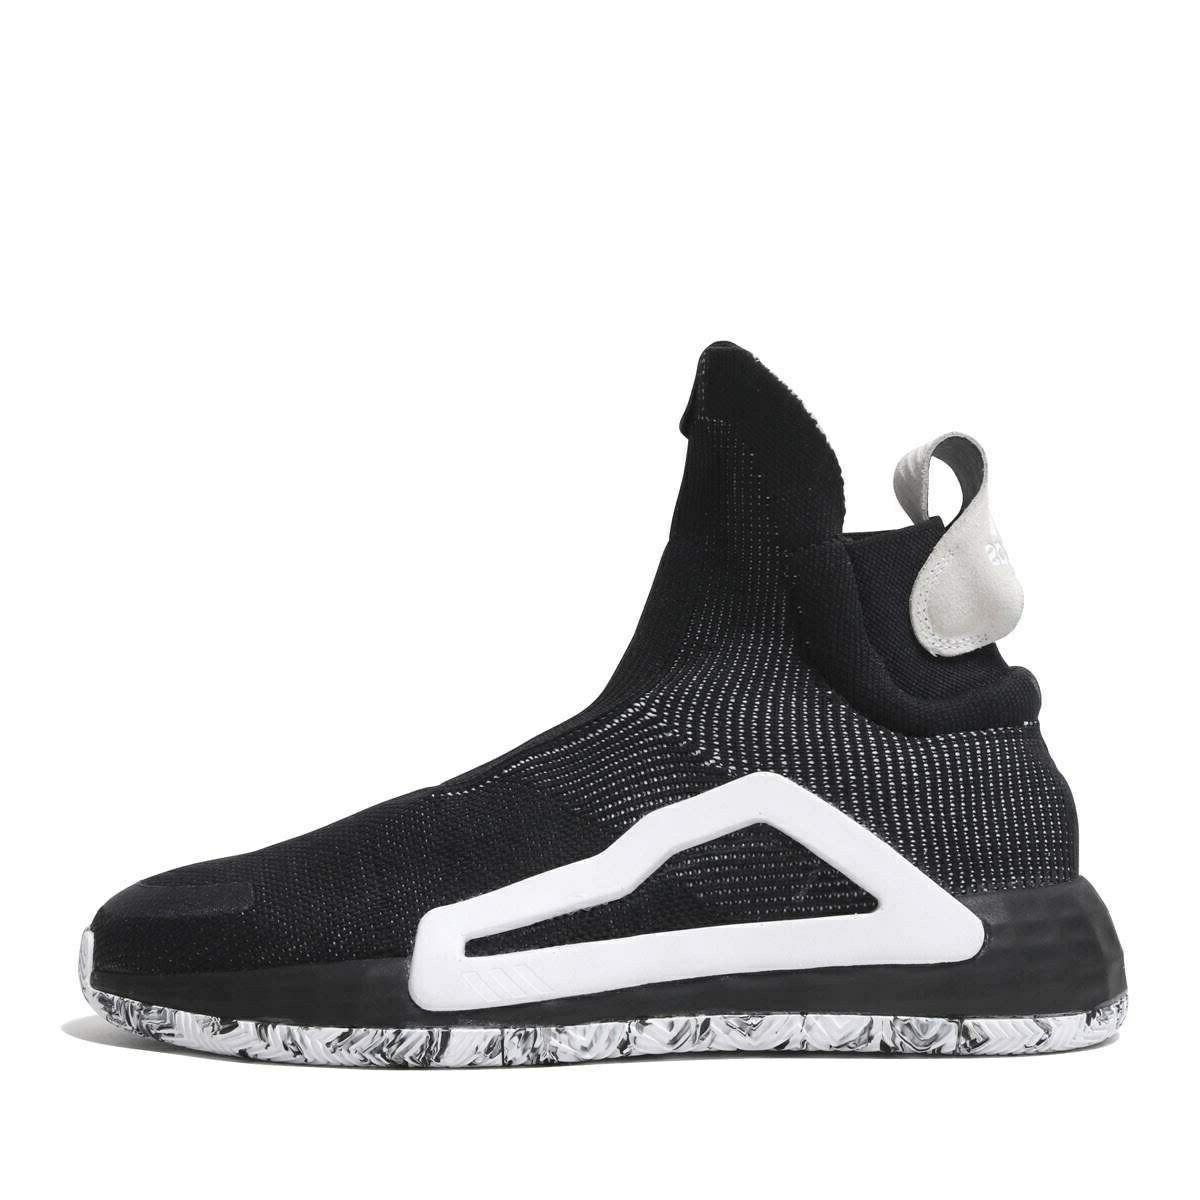 n3xt l3v3l bb9194 laceless basketball shoes black